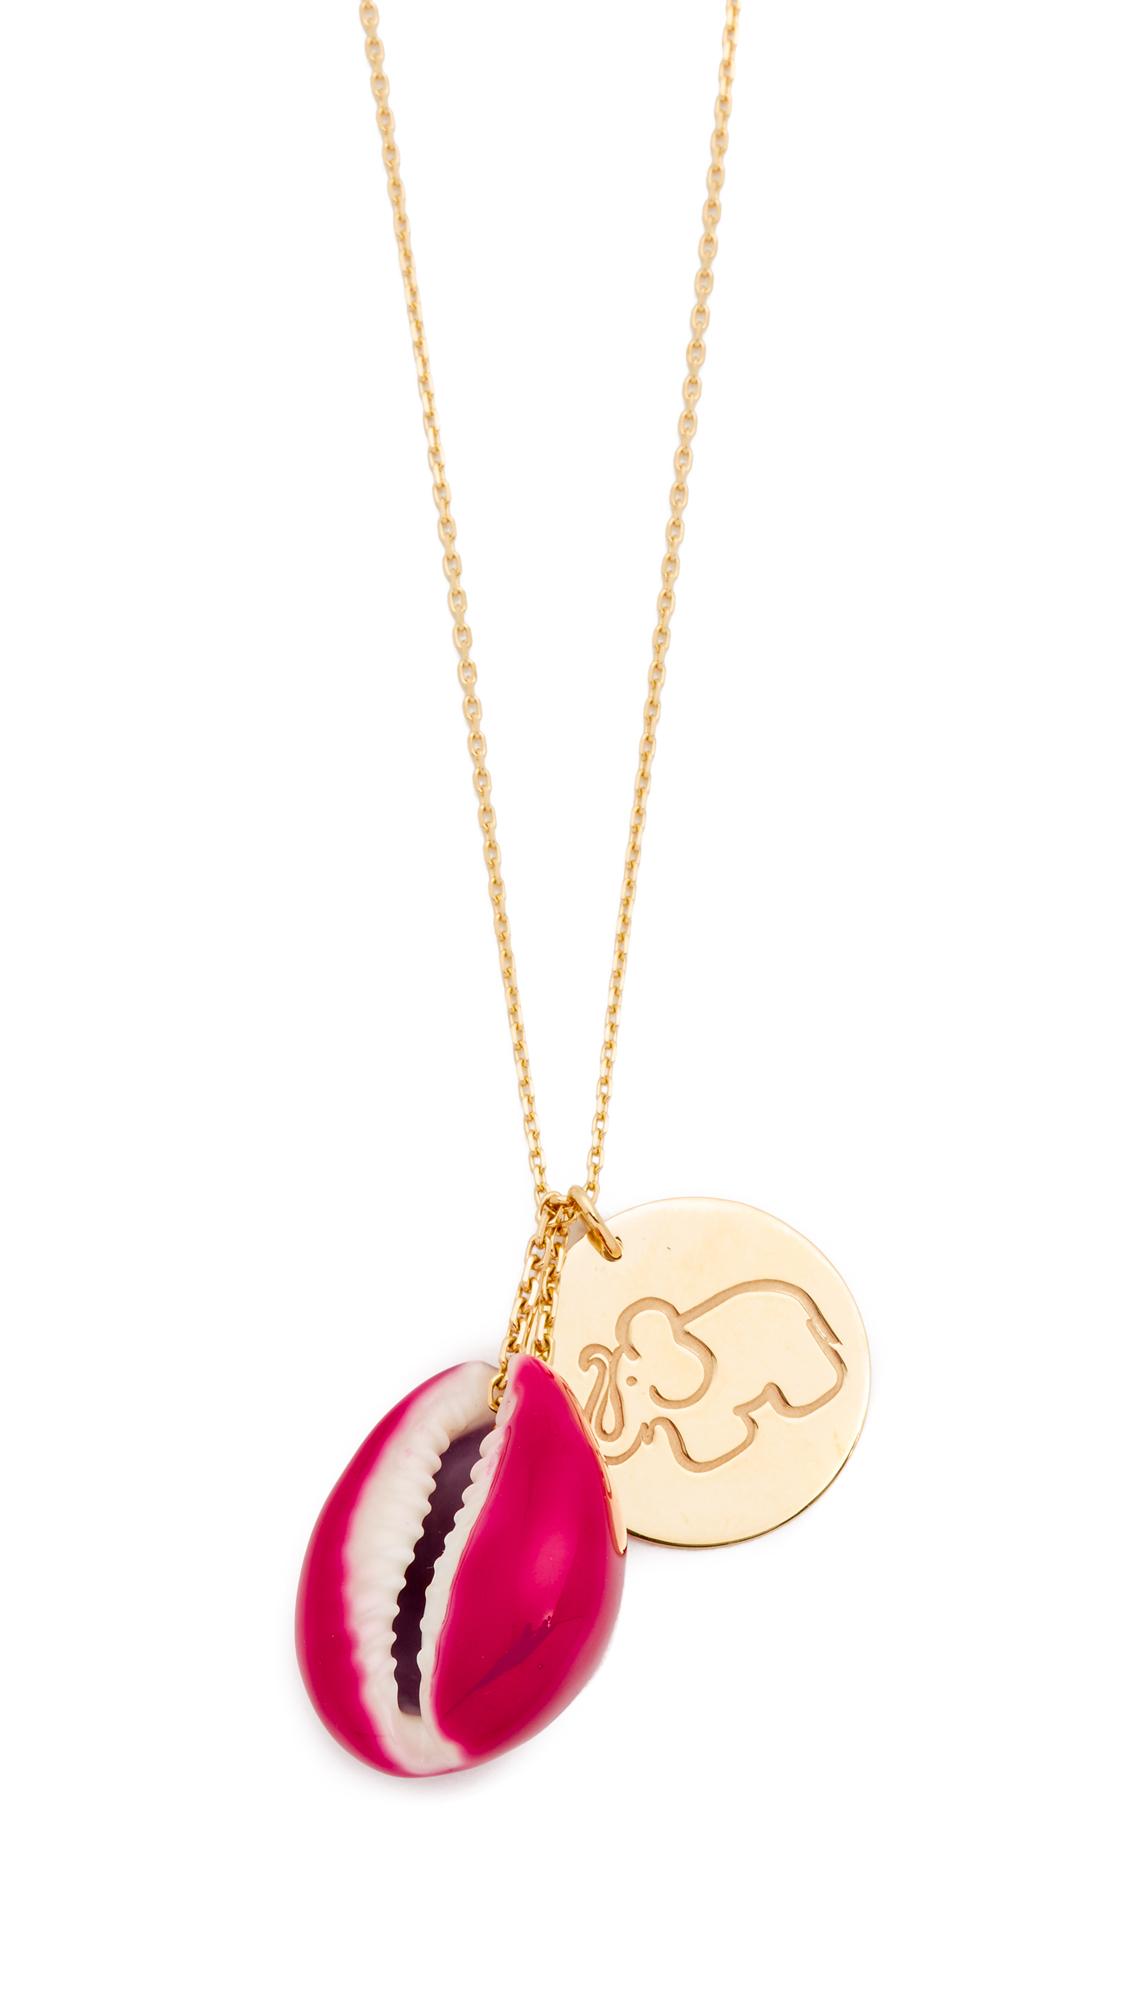 Ladybug Pendant Necklace Aur GREWcNfG4B